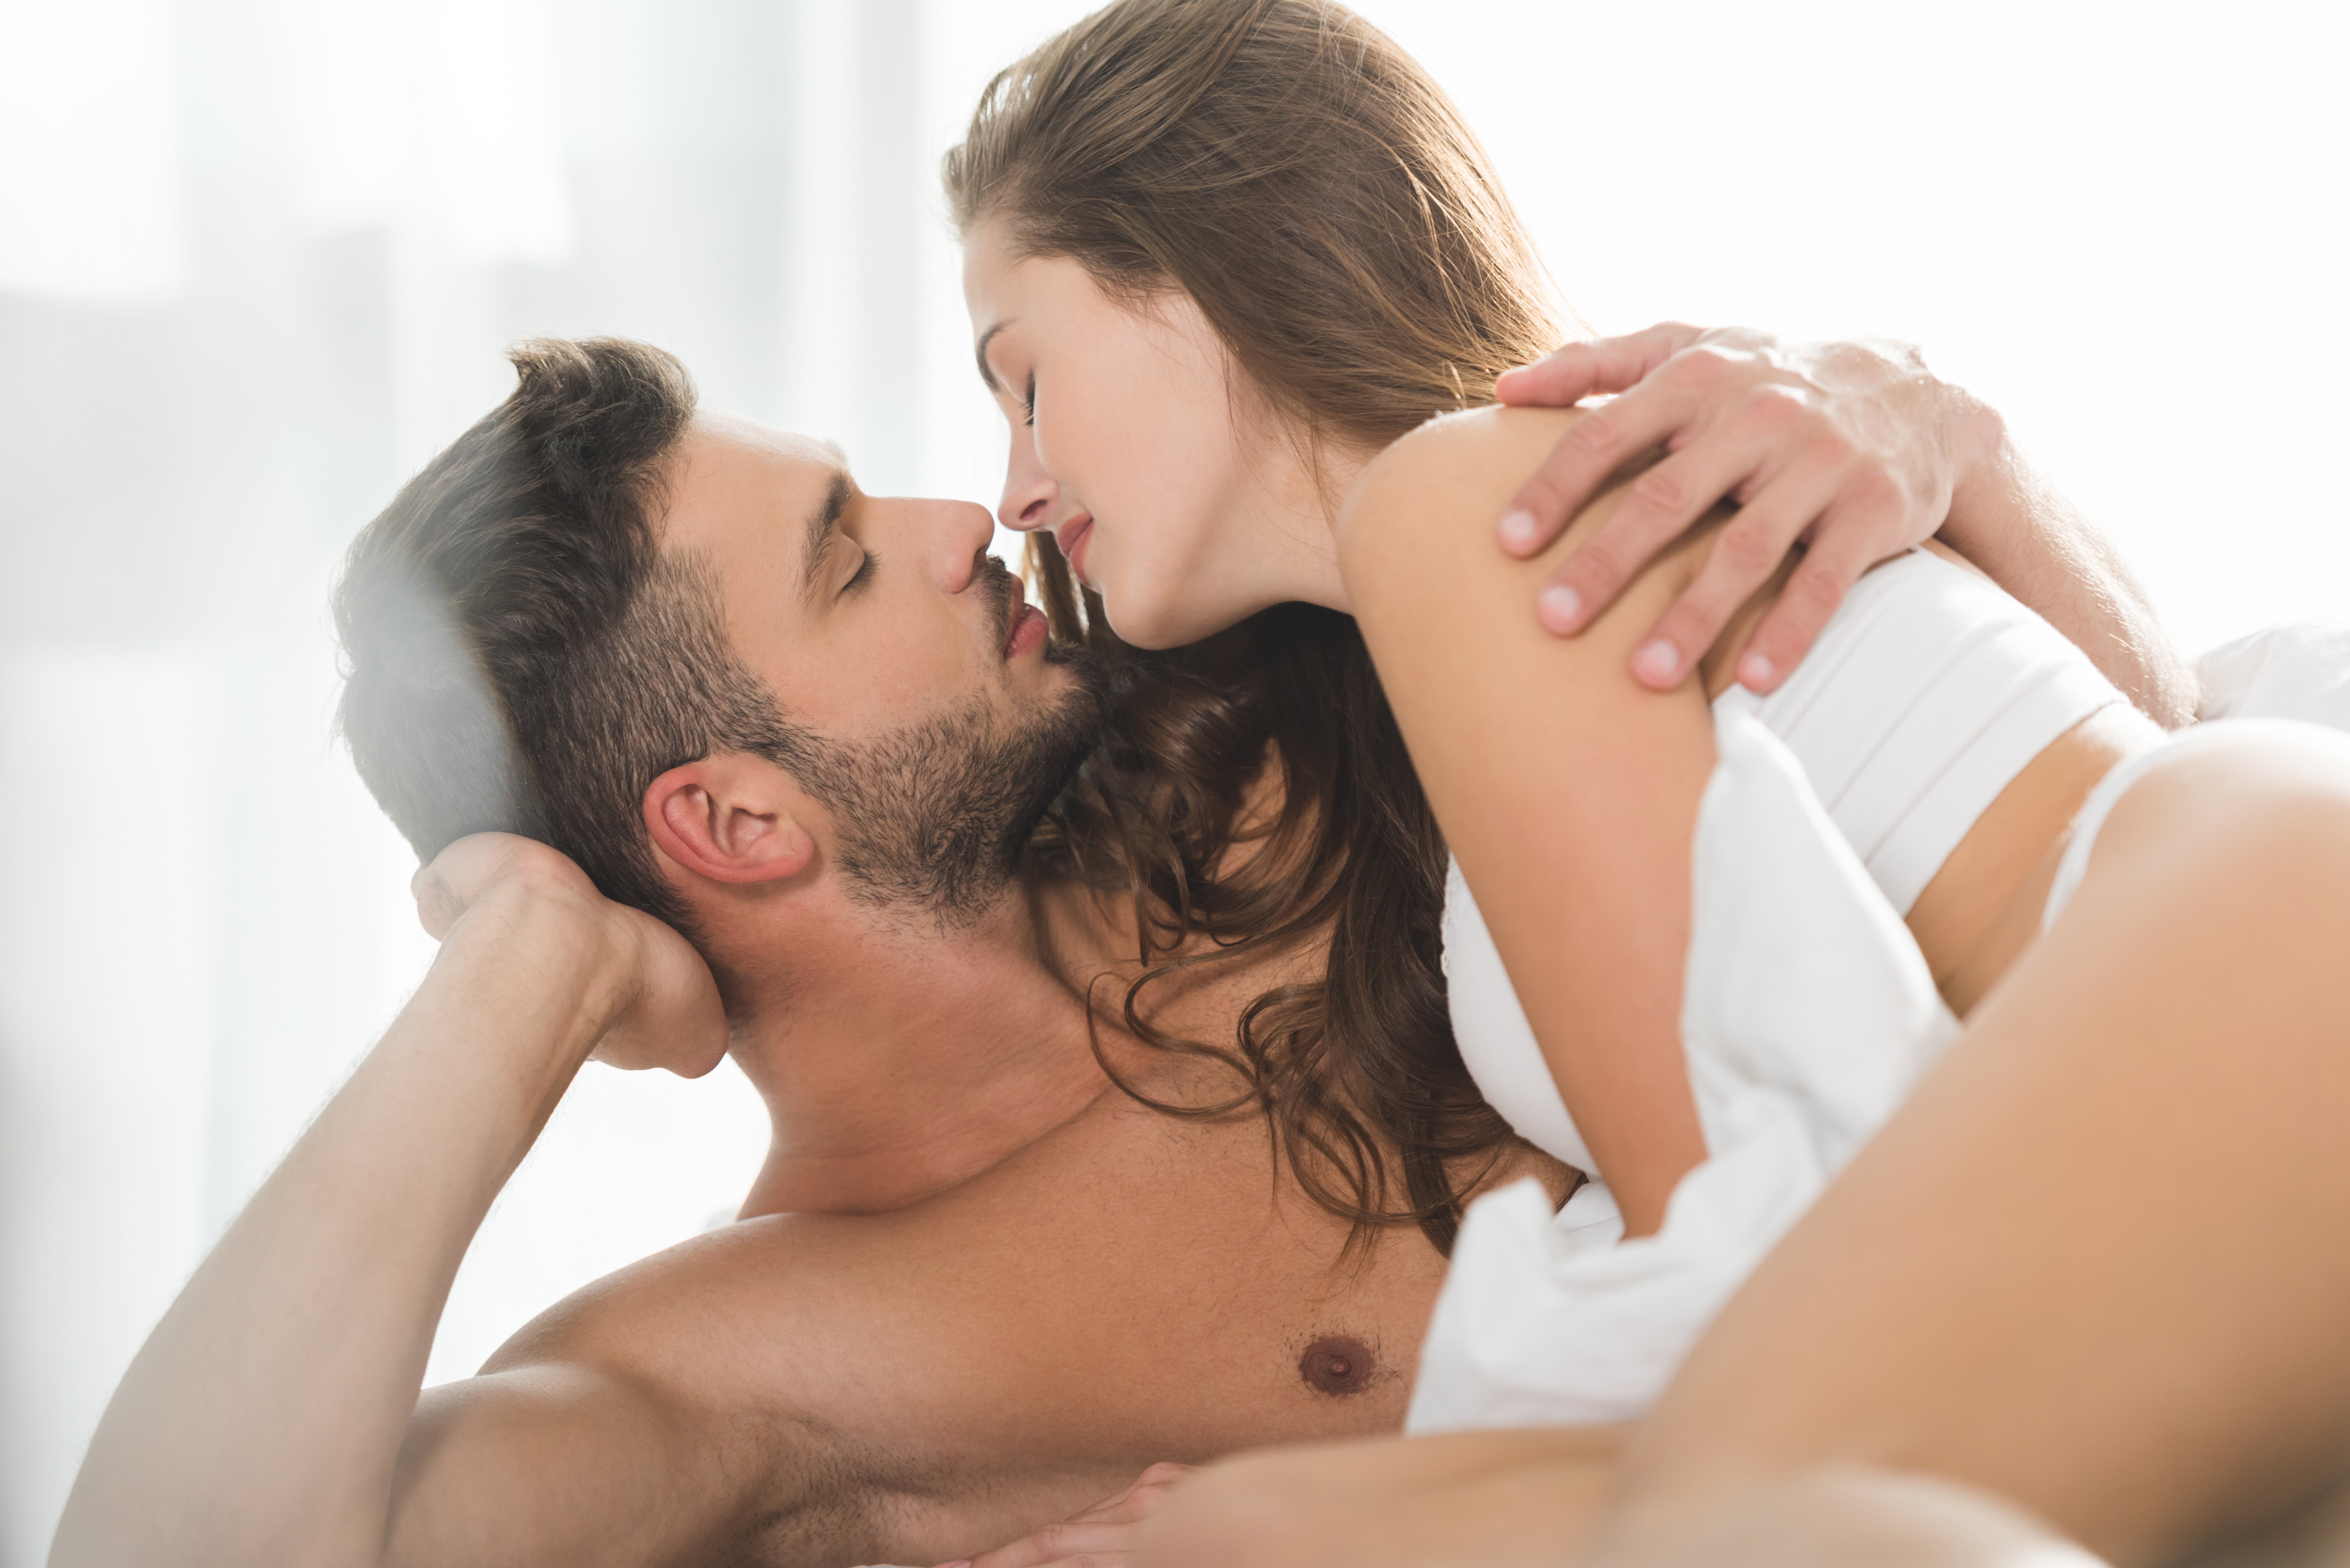 zdarma matka porno trubice